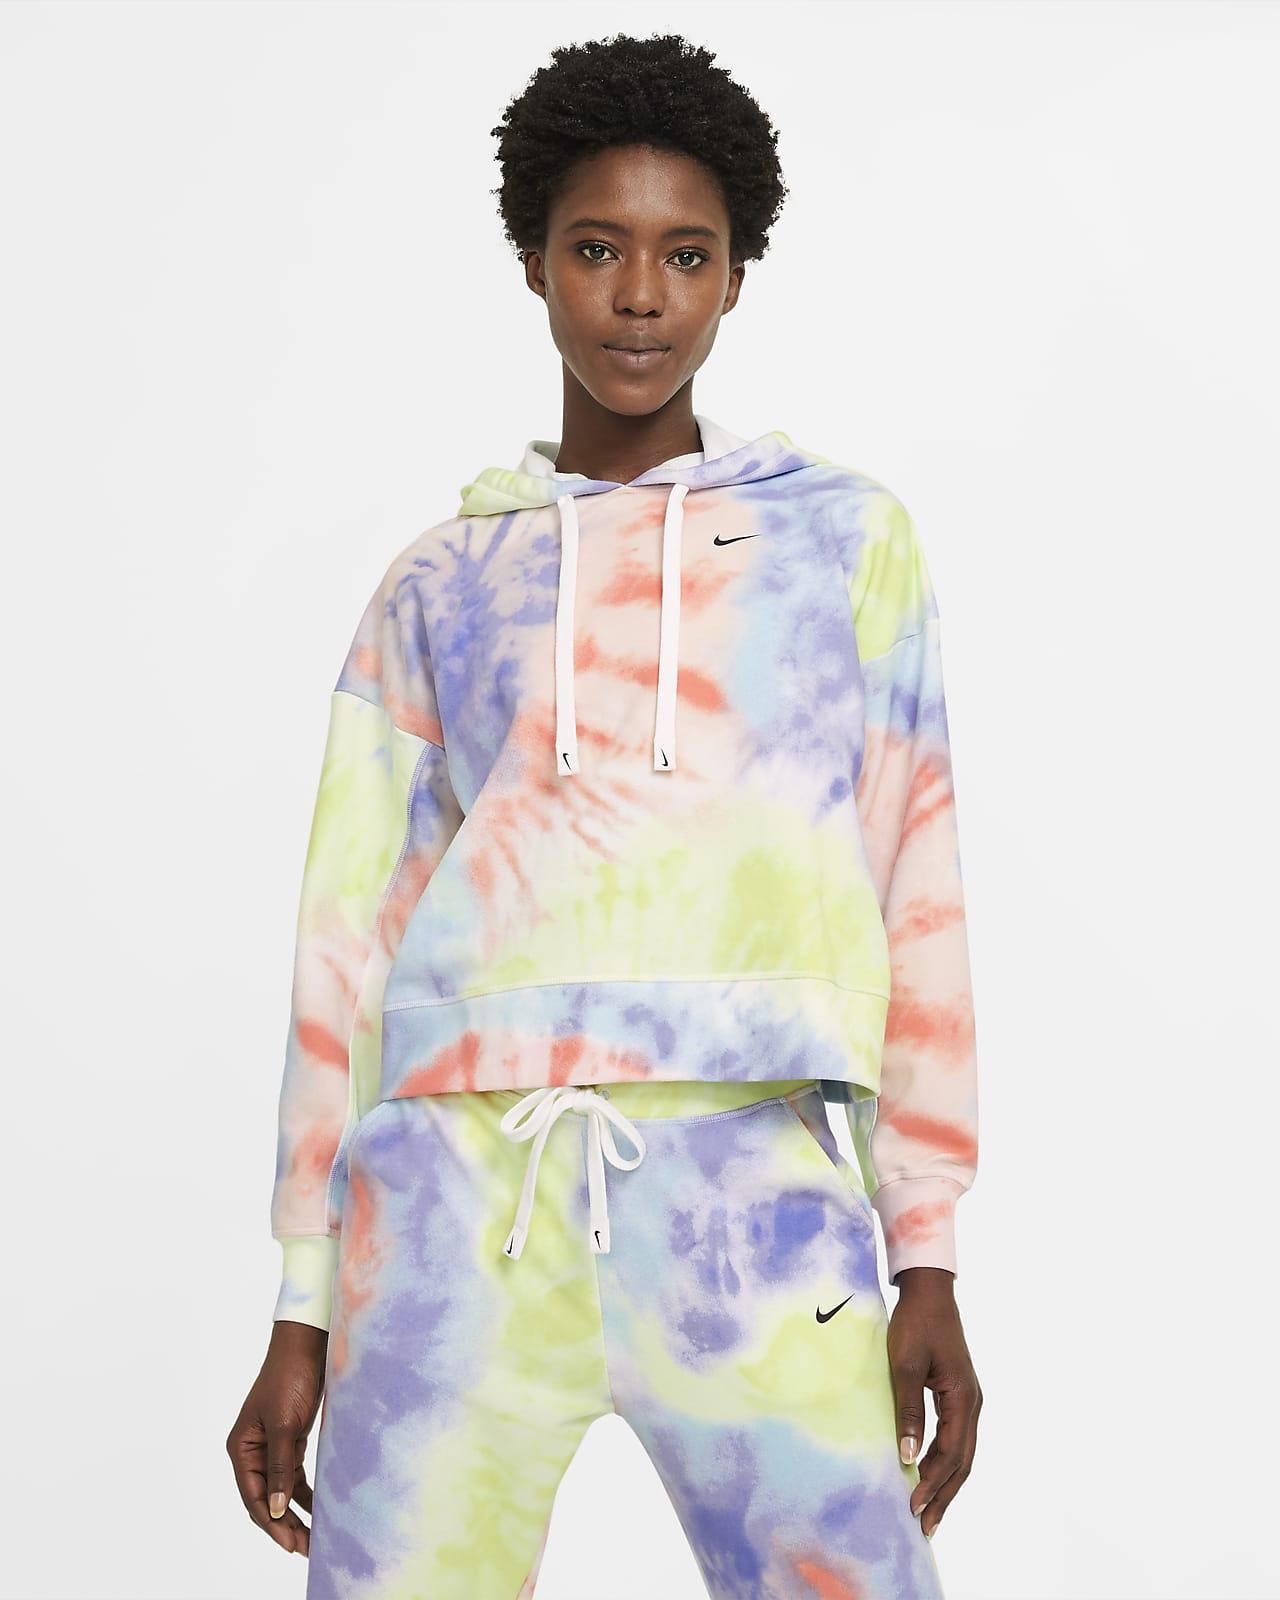 Nike Dri-FIT Get Fit Women's Tie-dye Pullover Training Hoodie